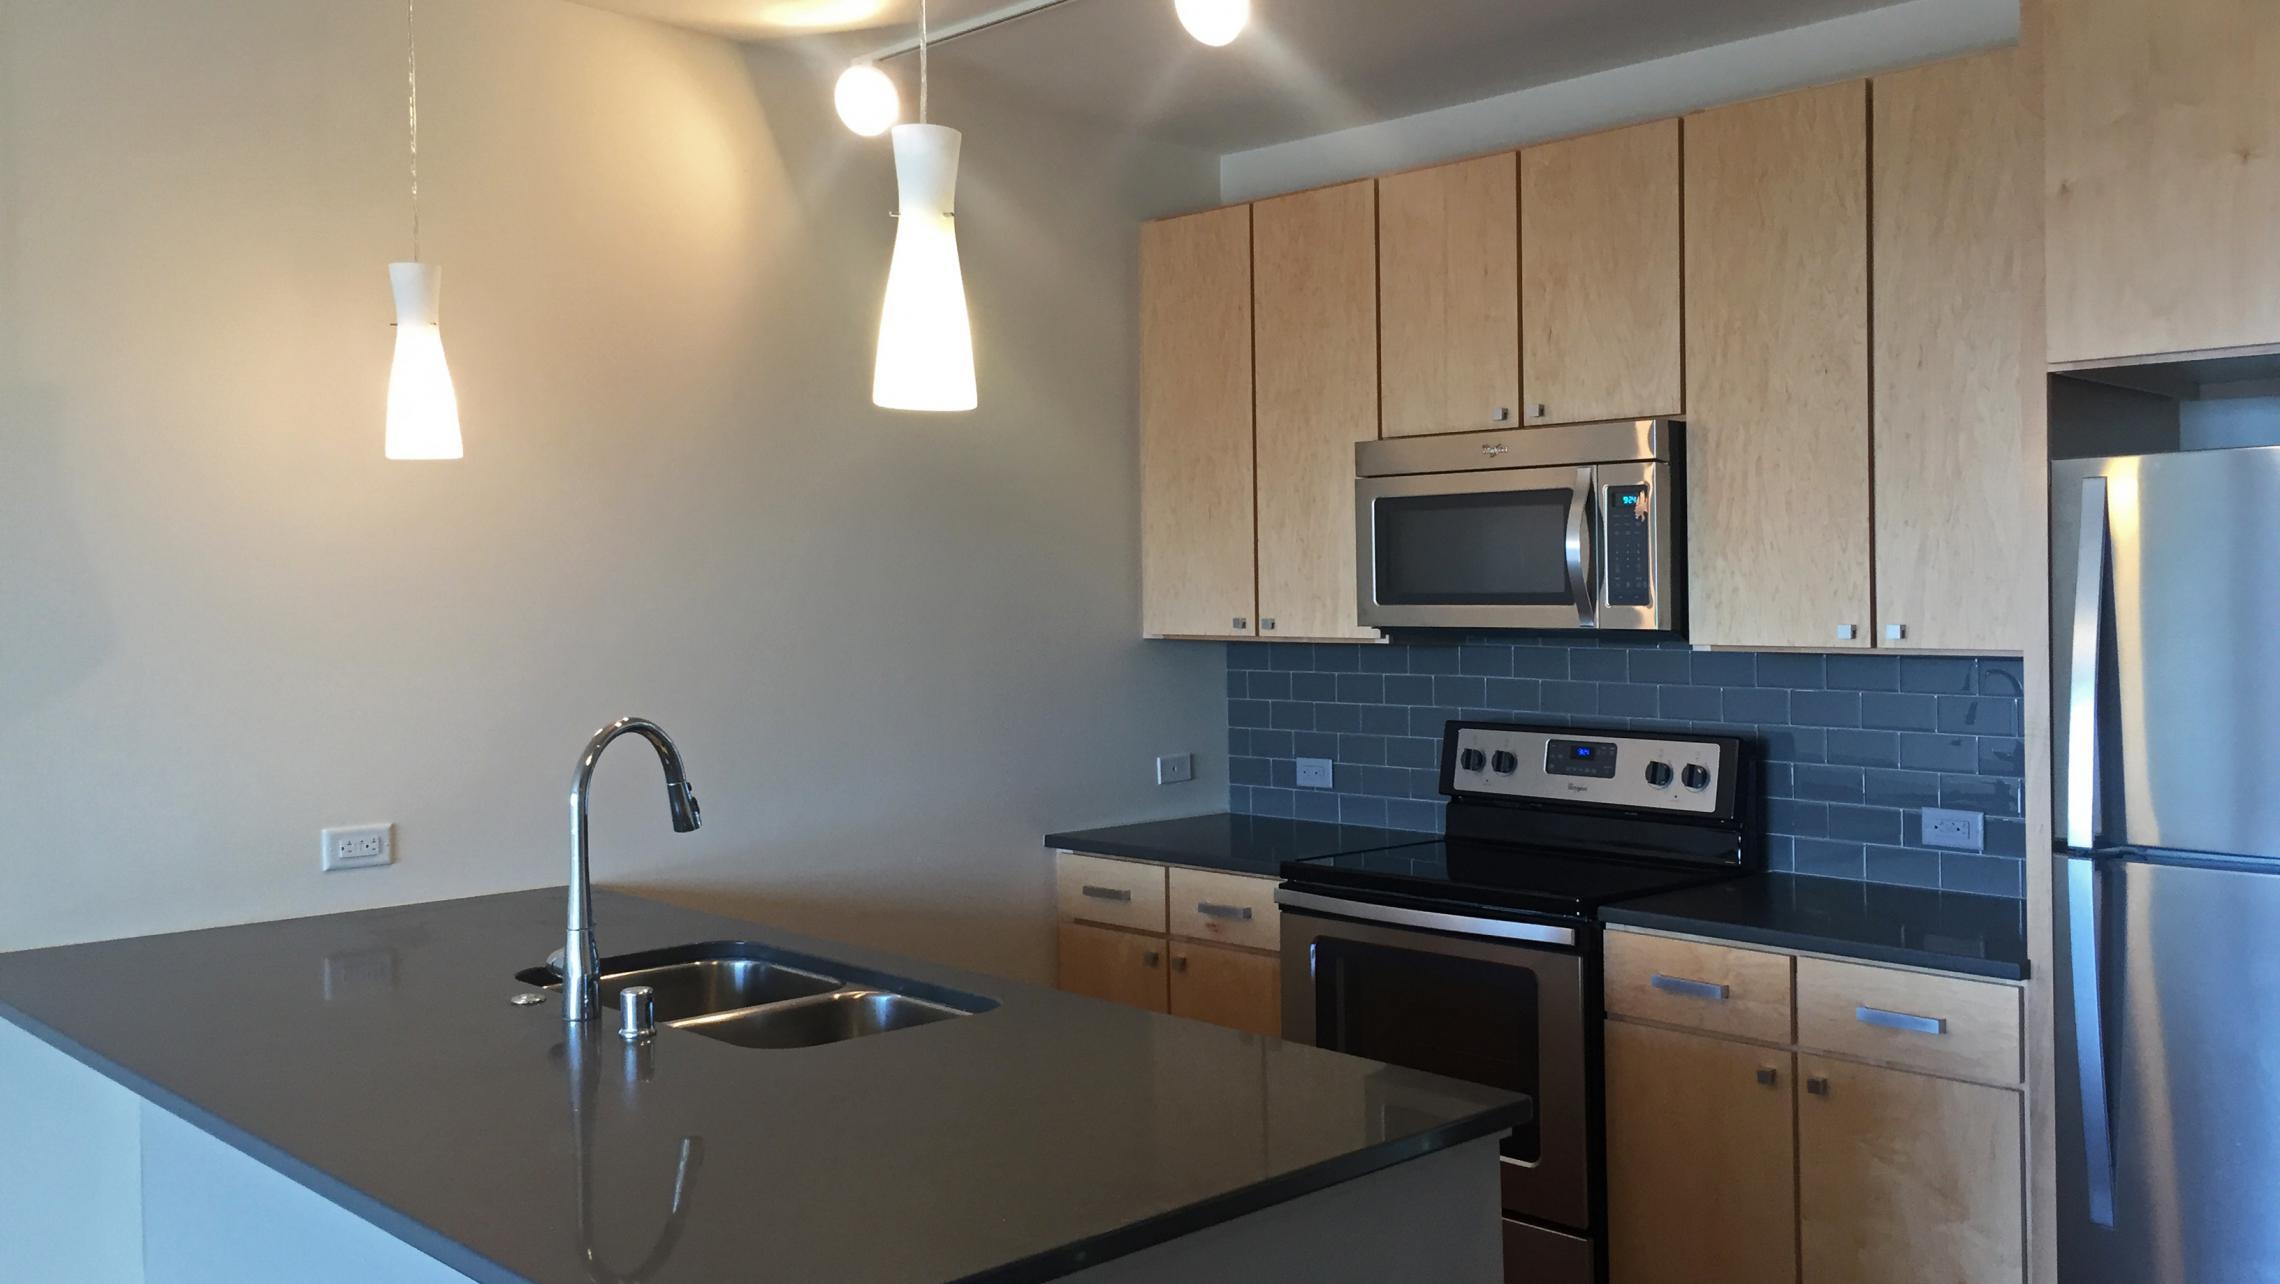 ULI Nine Line Apartment 323 - Kitchen Island